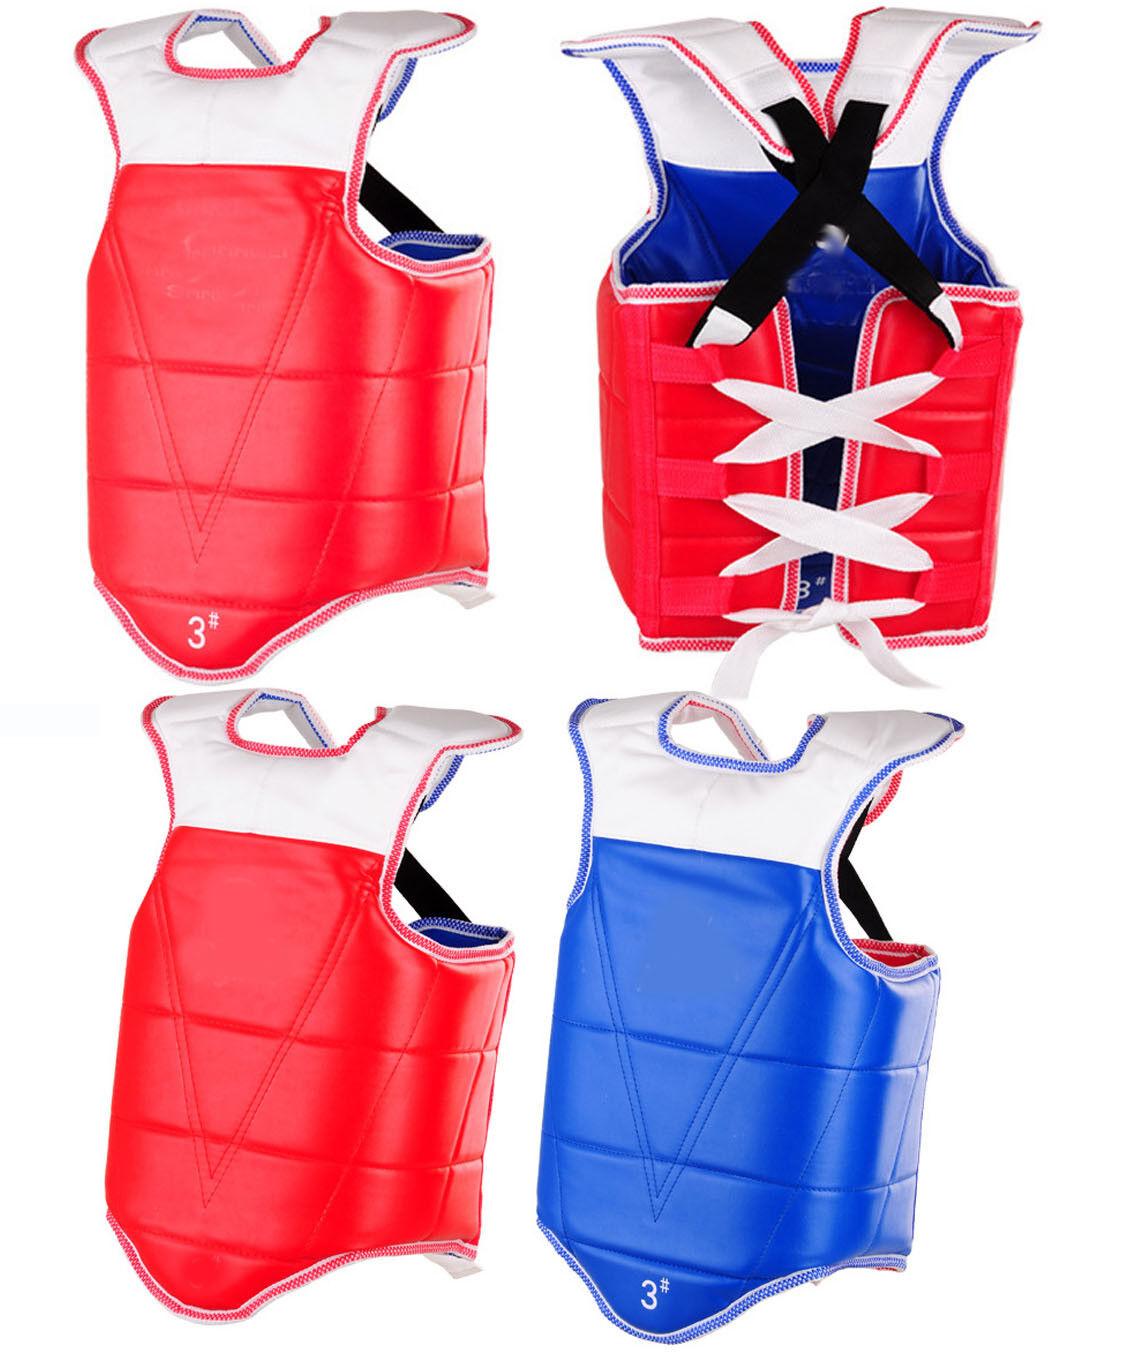 Adult kids sports  hogu Chest Predector Guard taekwondo TKD MMA Muay Thai Karate  limit buy